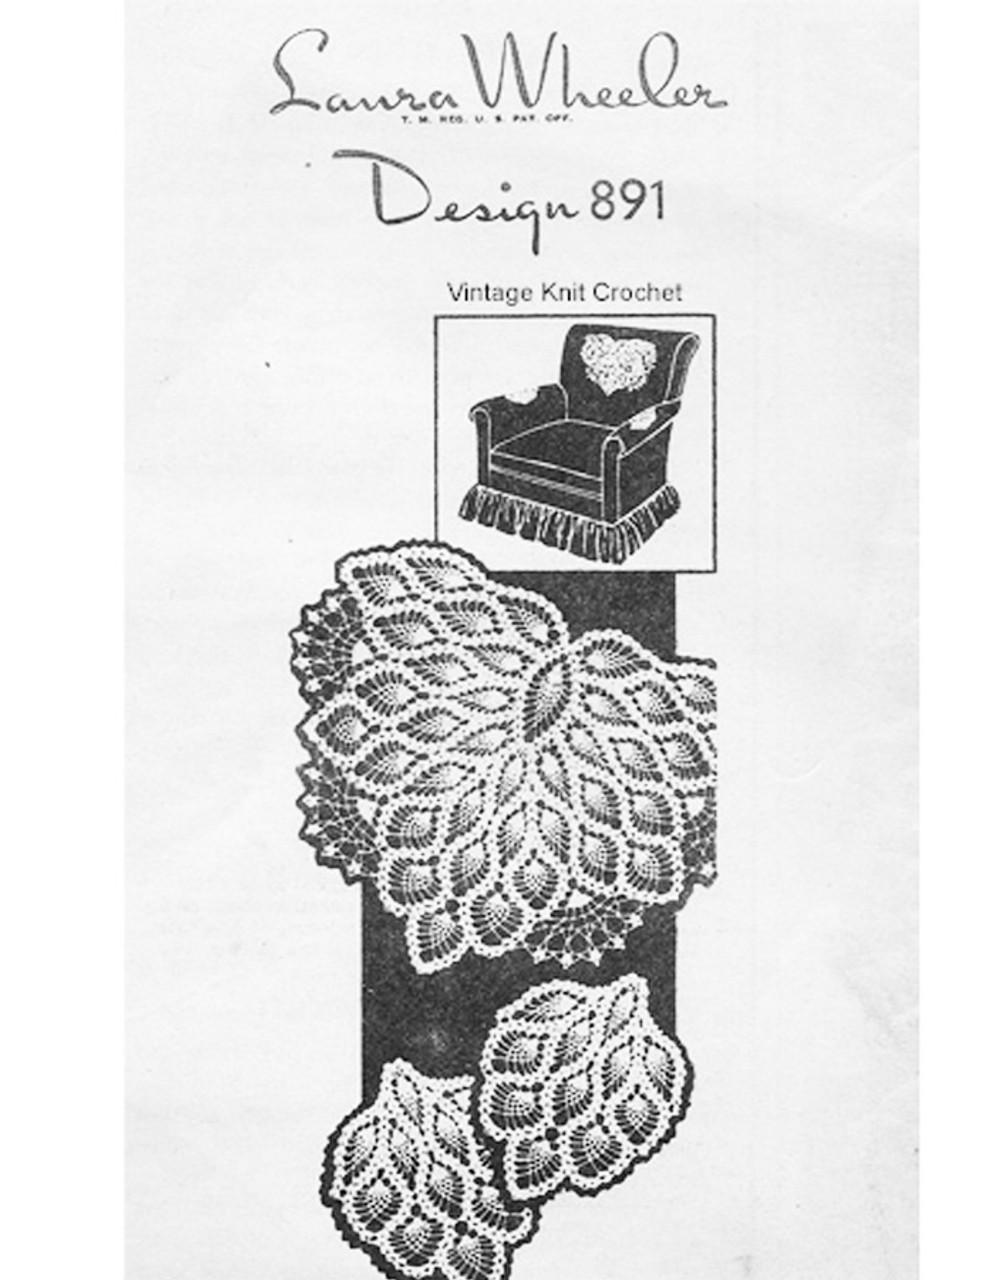 Pineapple Crochet Chair Set Pattern Mail Order 891